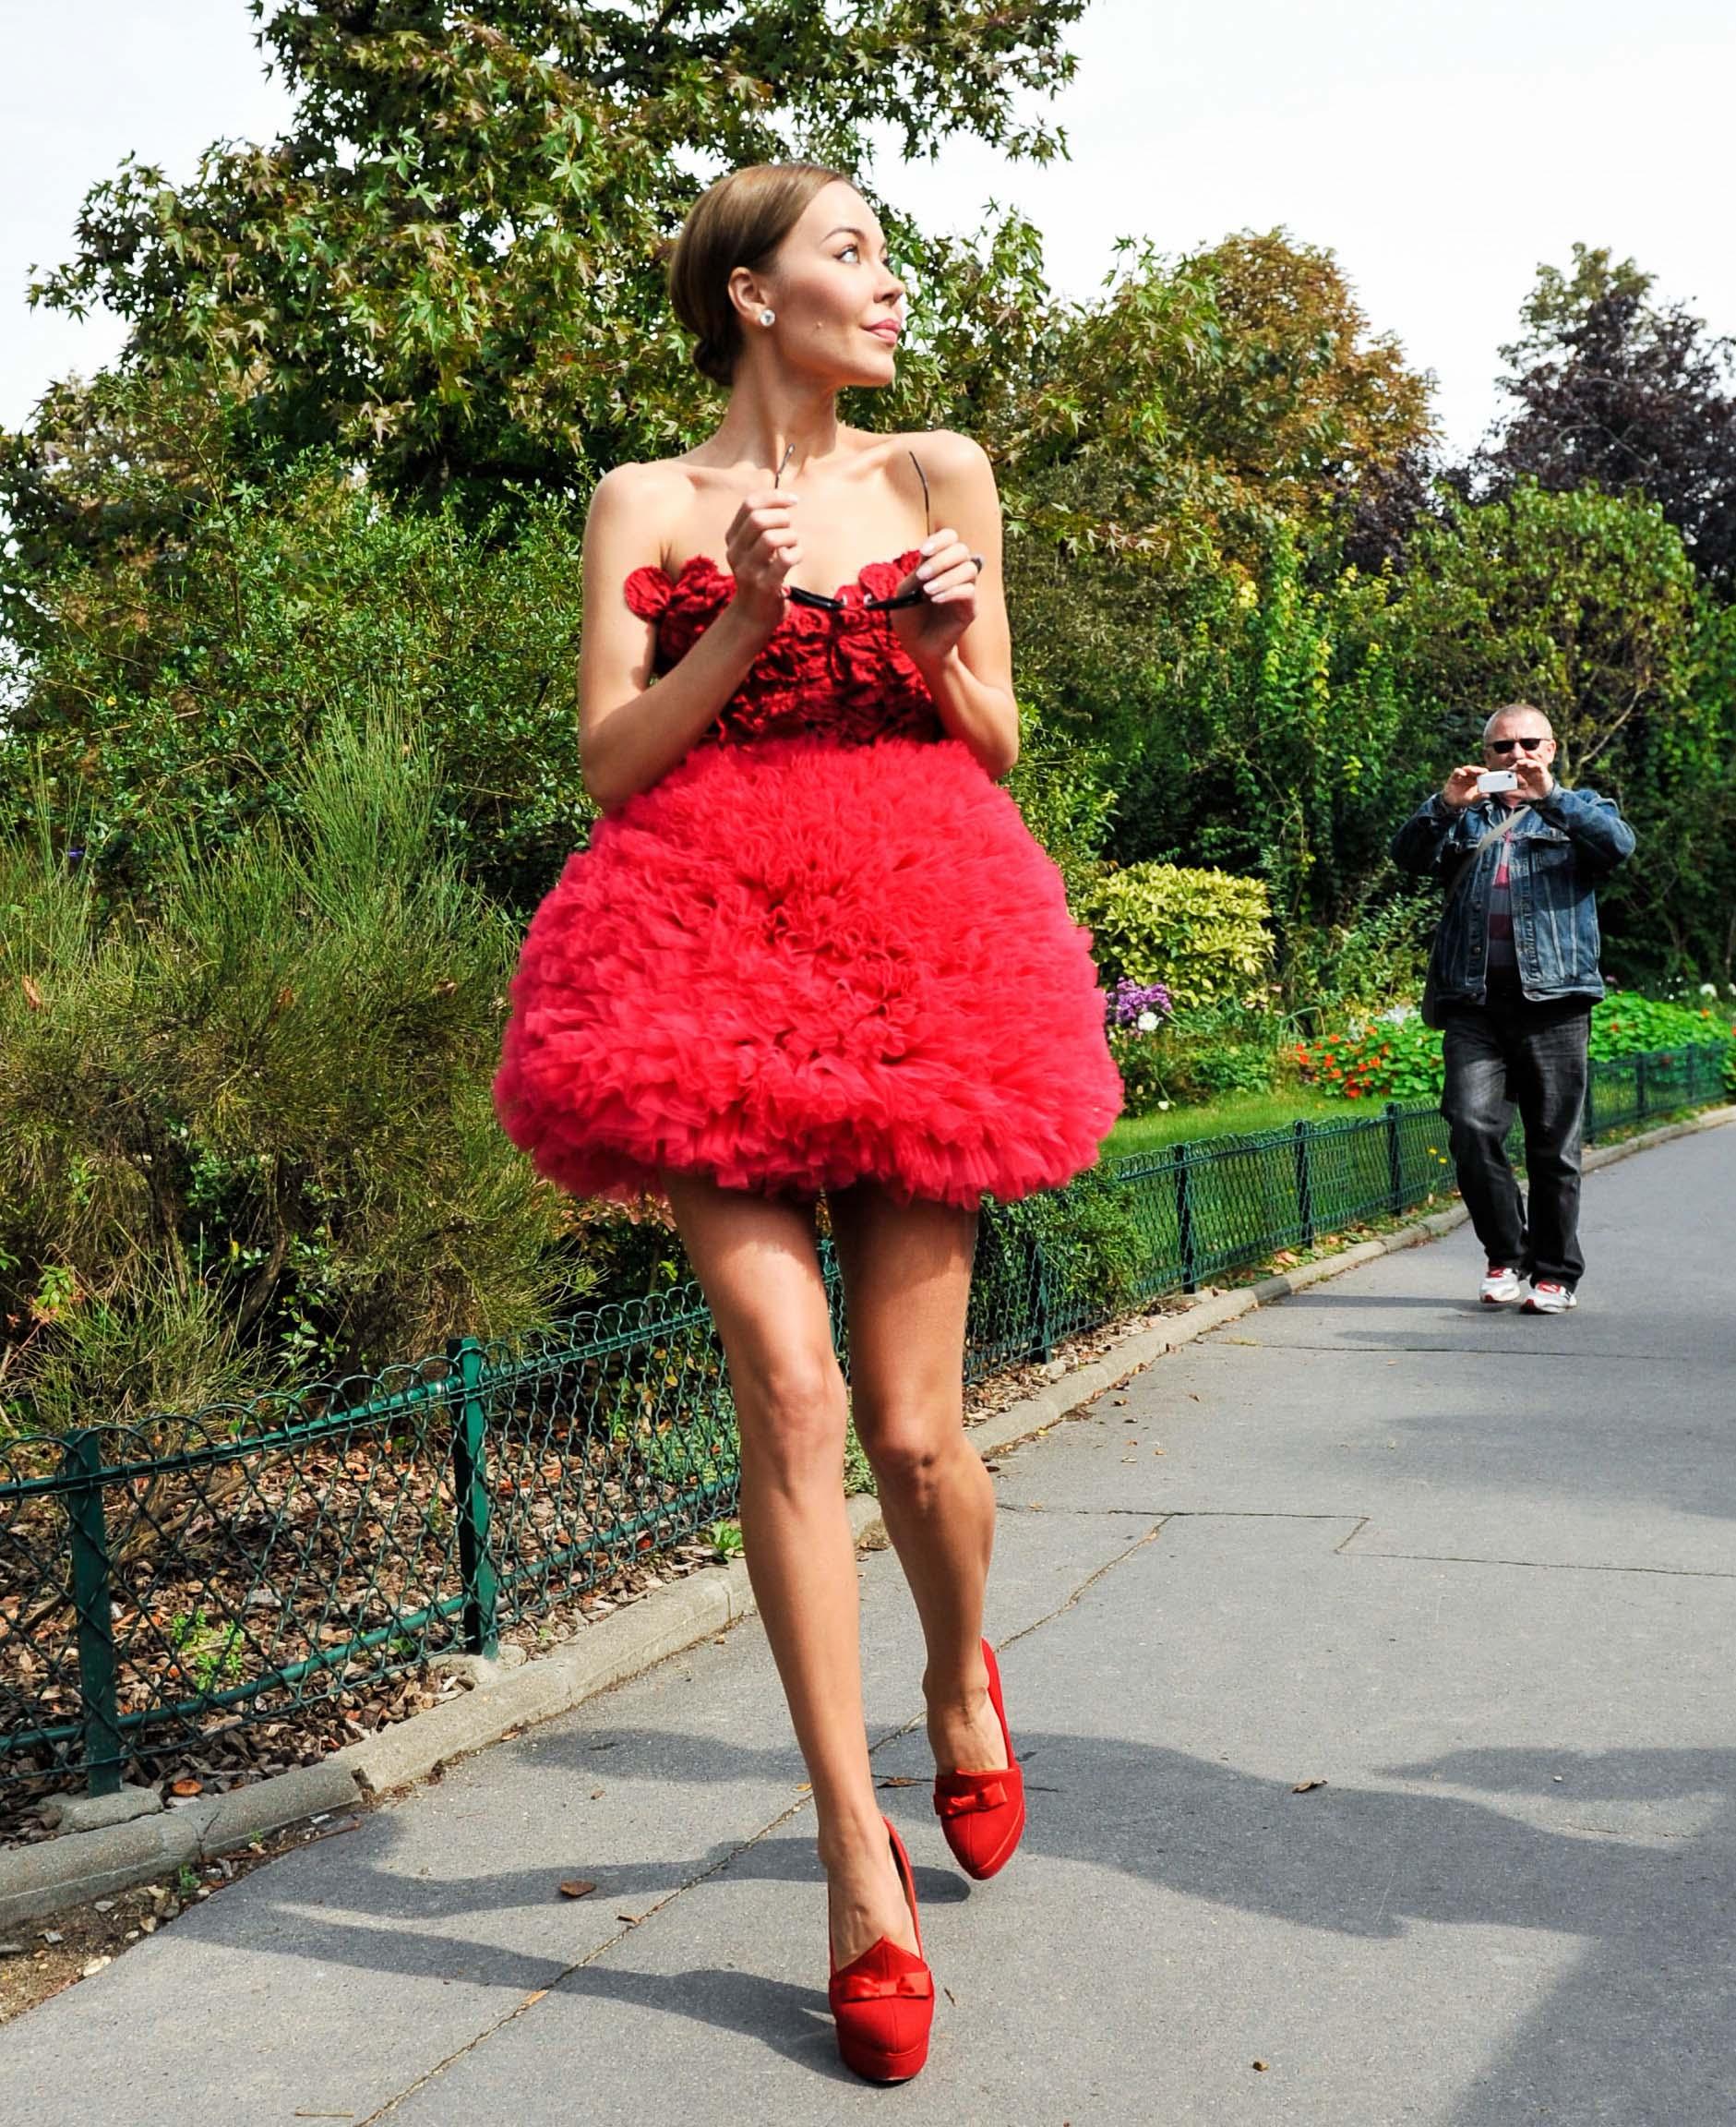 StreetStyle_ParisFashionWeek_LeandroJusten_027.jpg